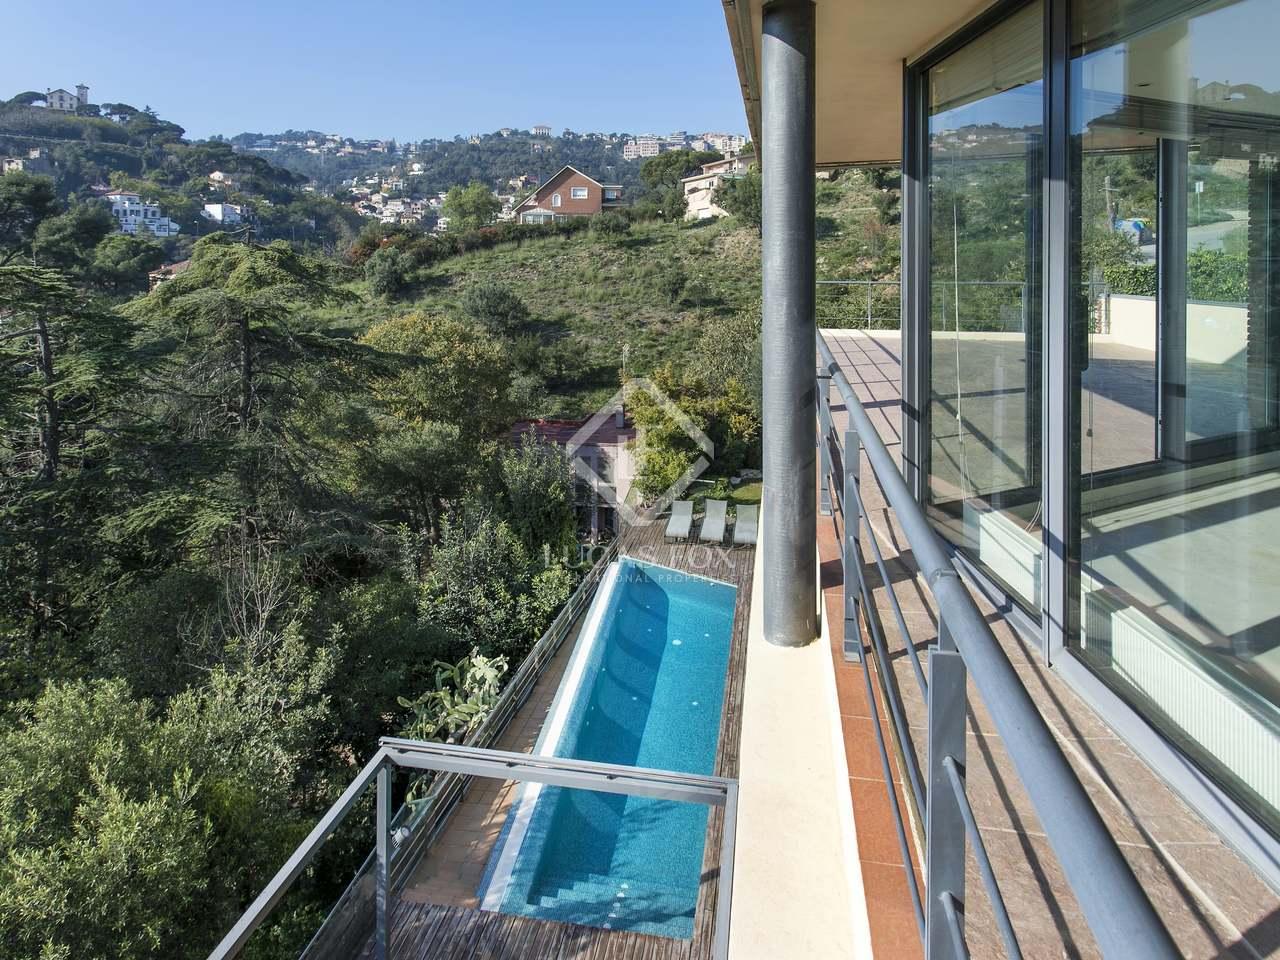 Casa de 4 dormitorios con piscina en venta en sarri for Casas con piscina baratas barcelona